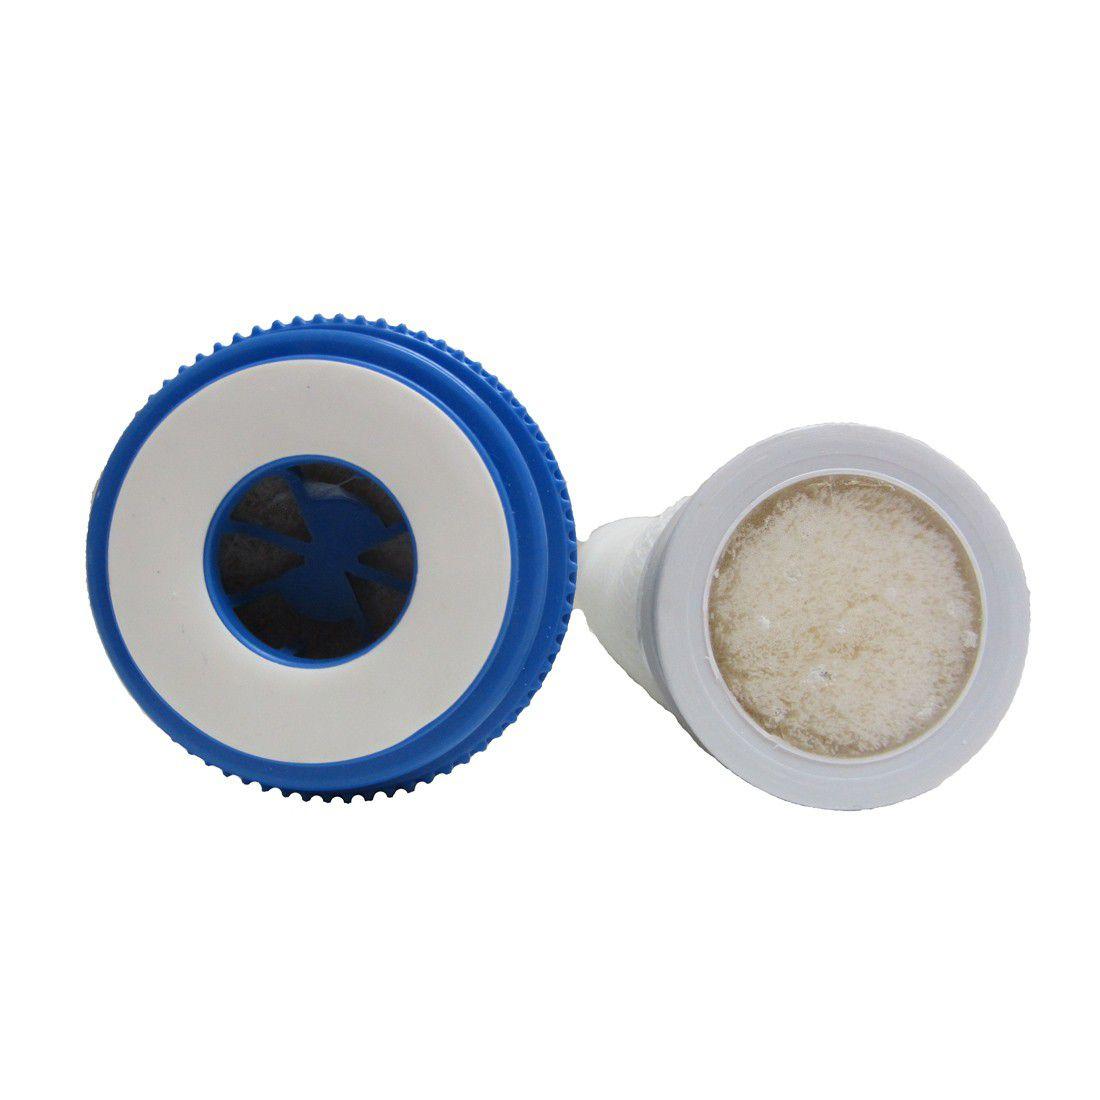 Line Water Filter Filtershop Triple Direct Line Water Filter Buy Online In South